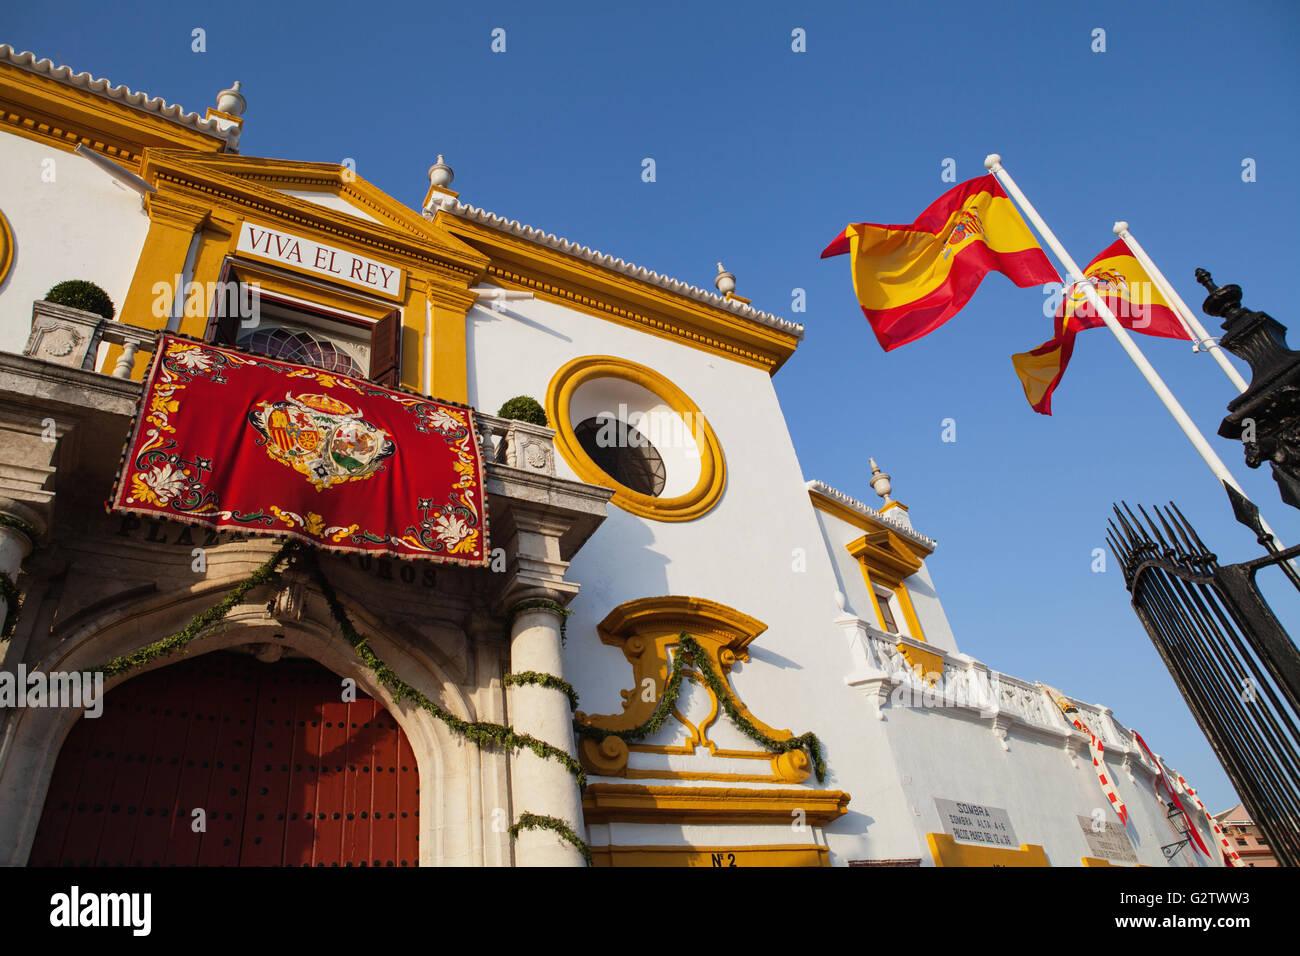 Spain, Andalucia, Seville, Plaza de Torres de la Real Maestranza de Caballeria. - Stock Image